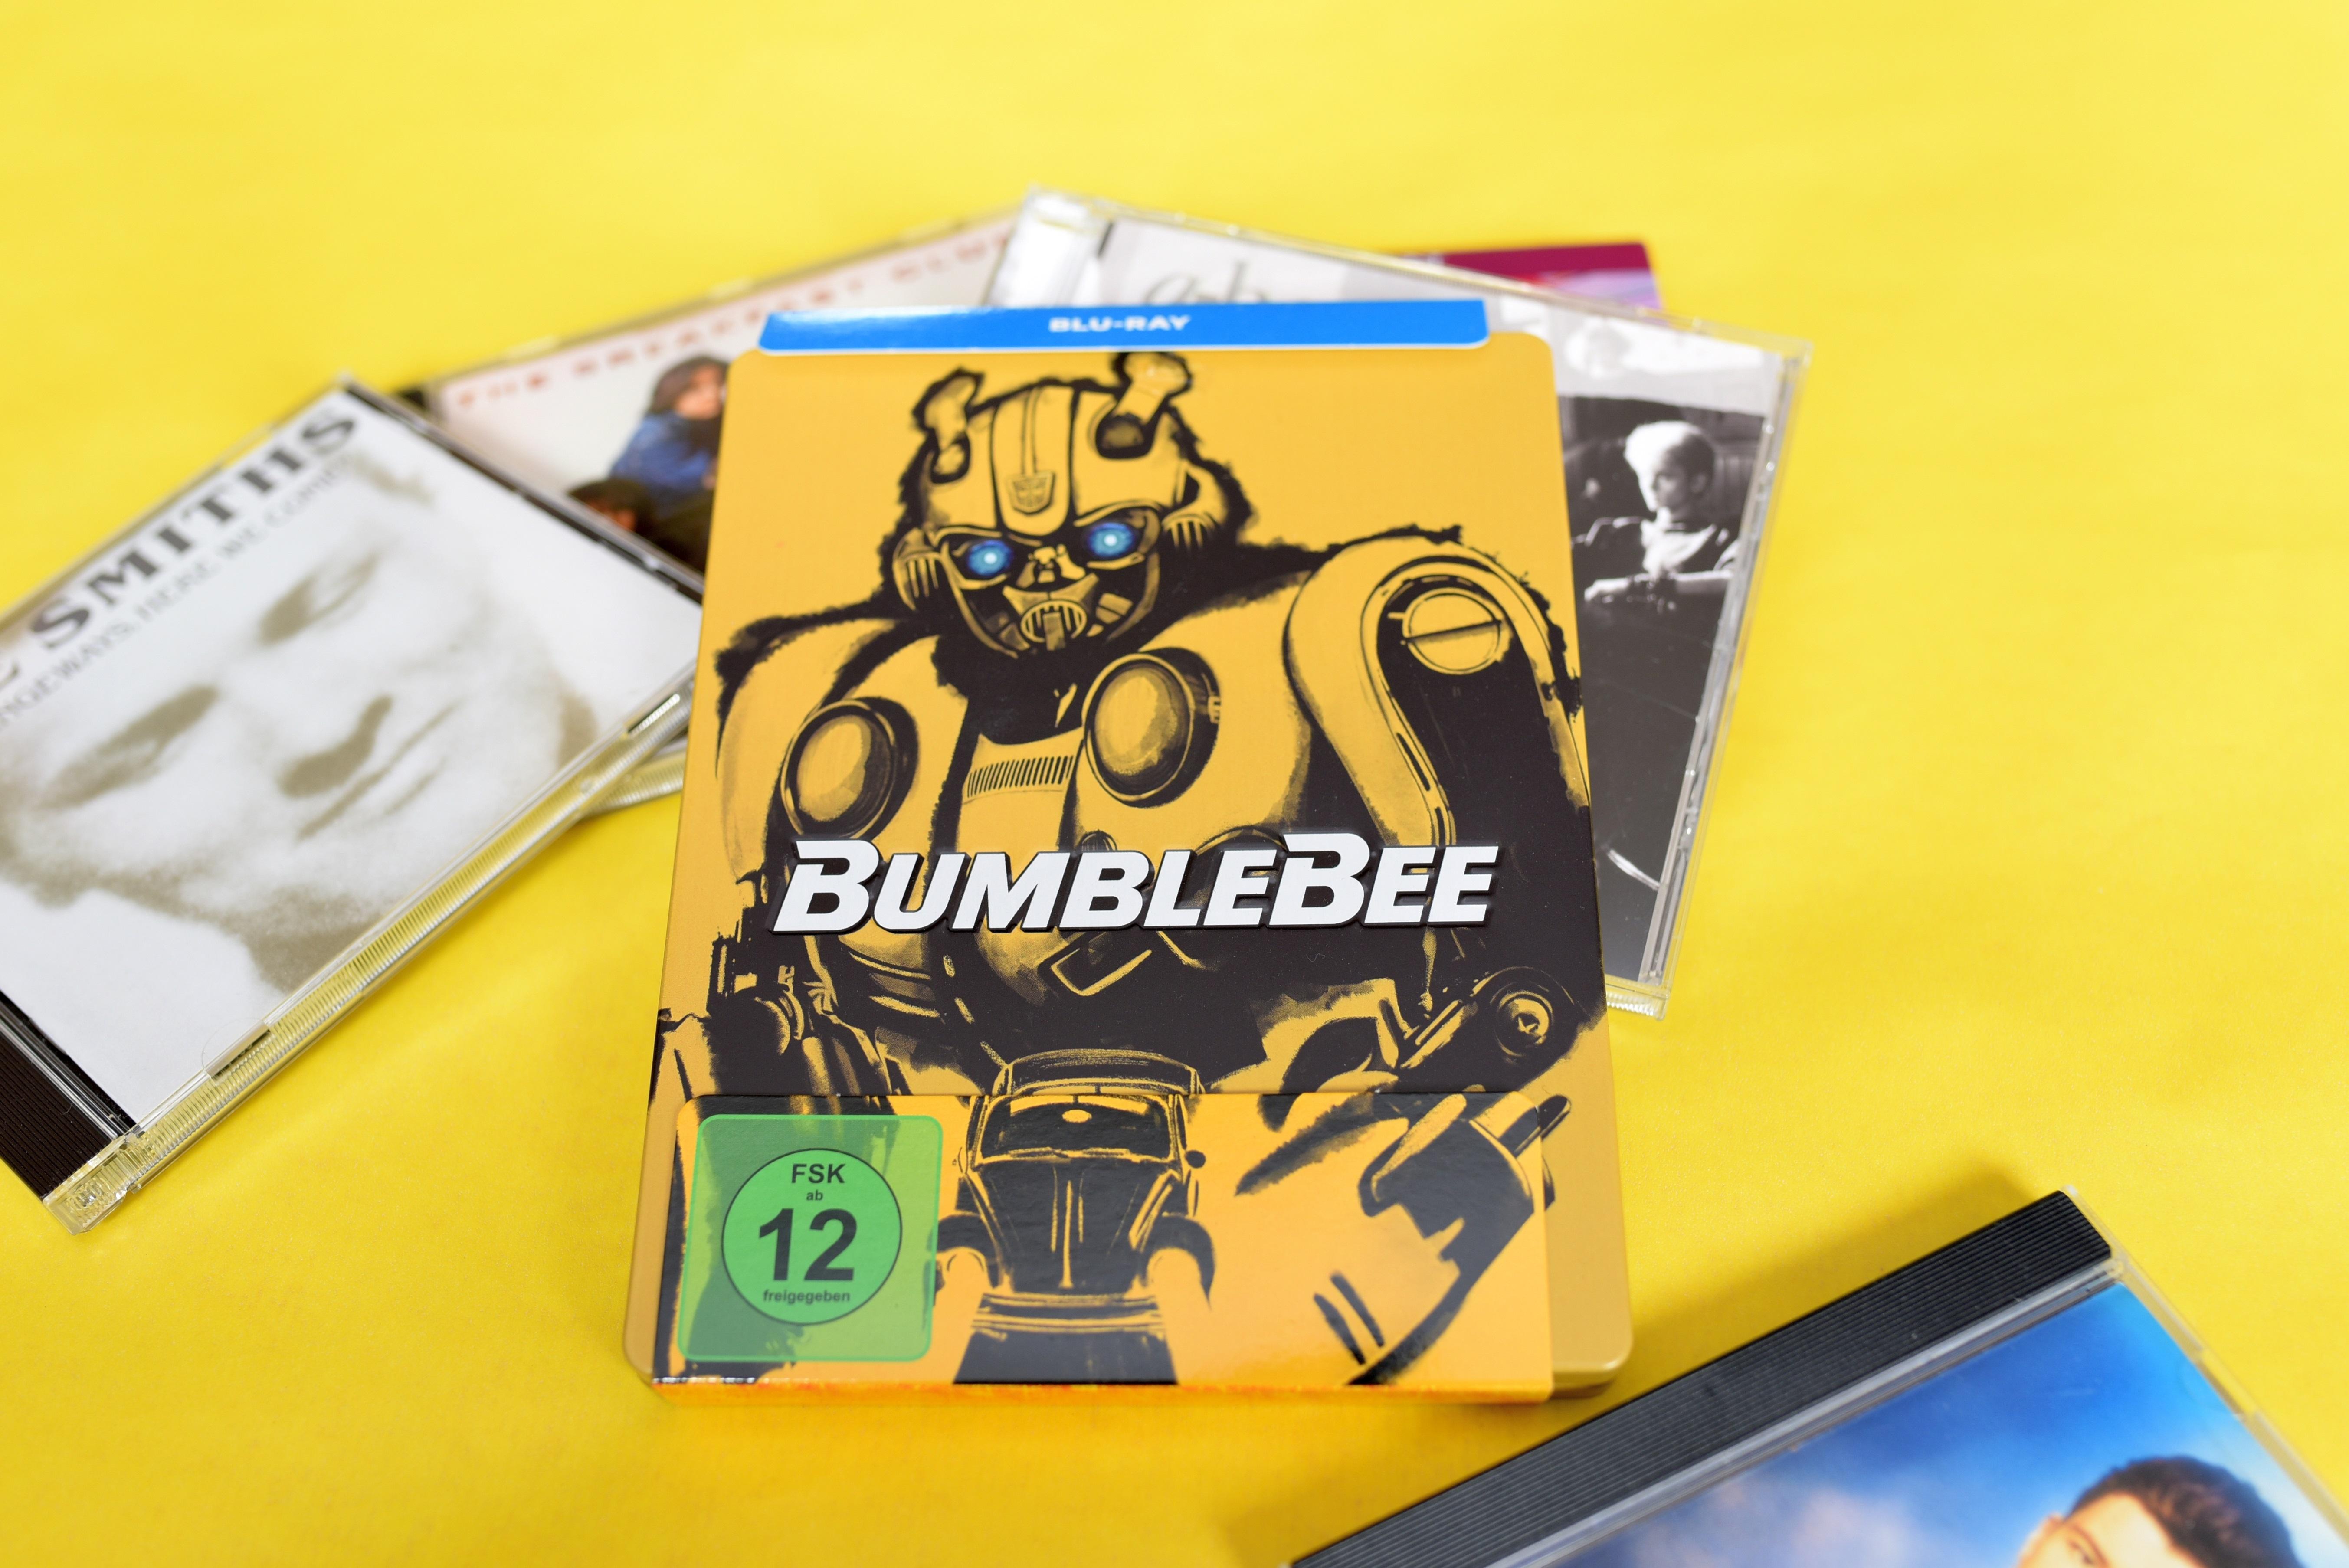 Bumblebee Blu-Ray Steelbook